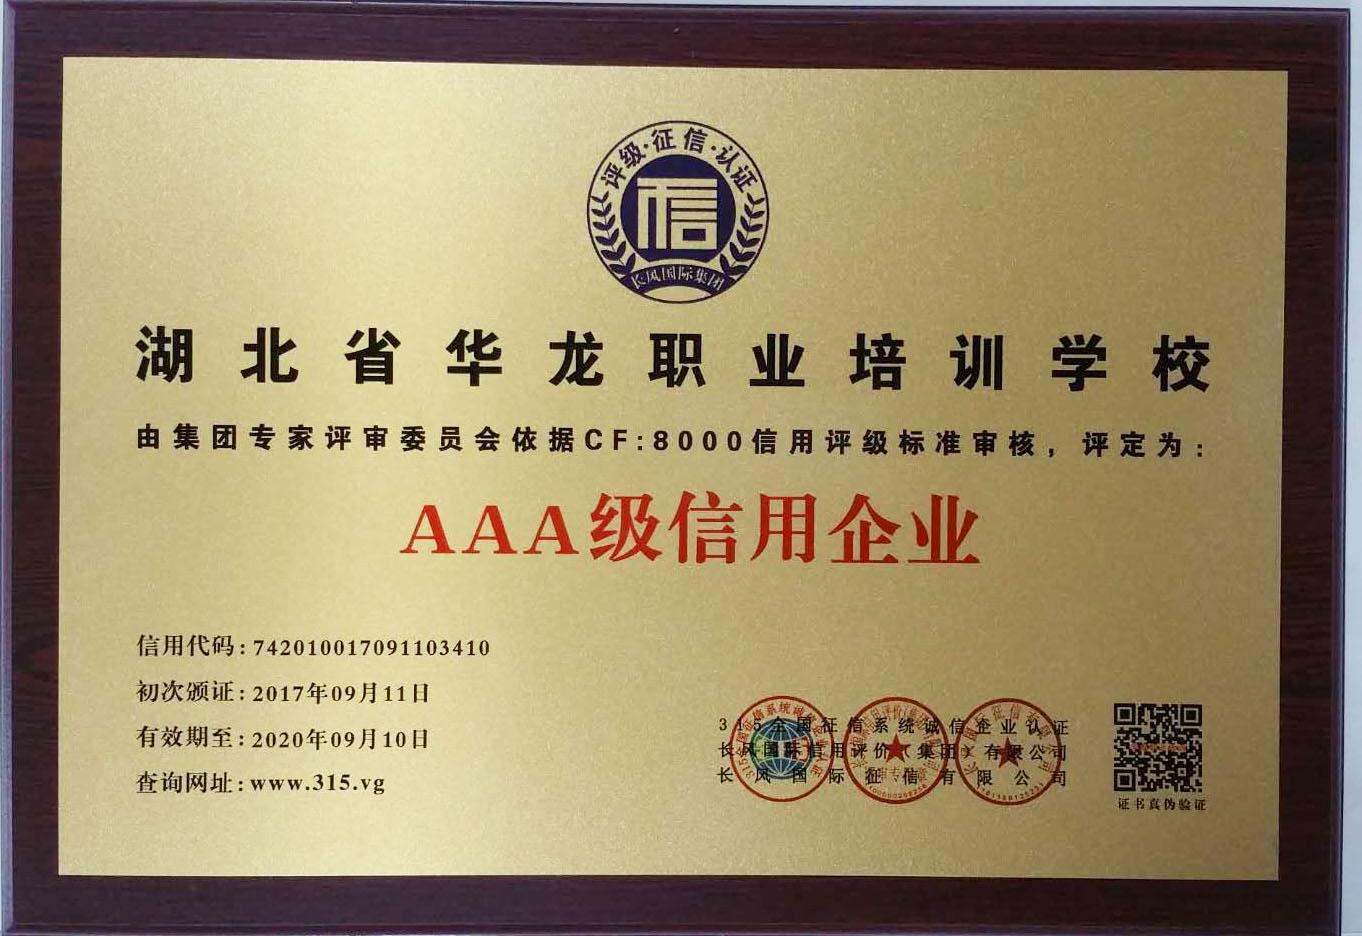 AAA信用企业 - 铜牌